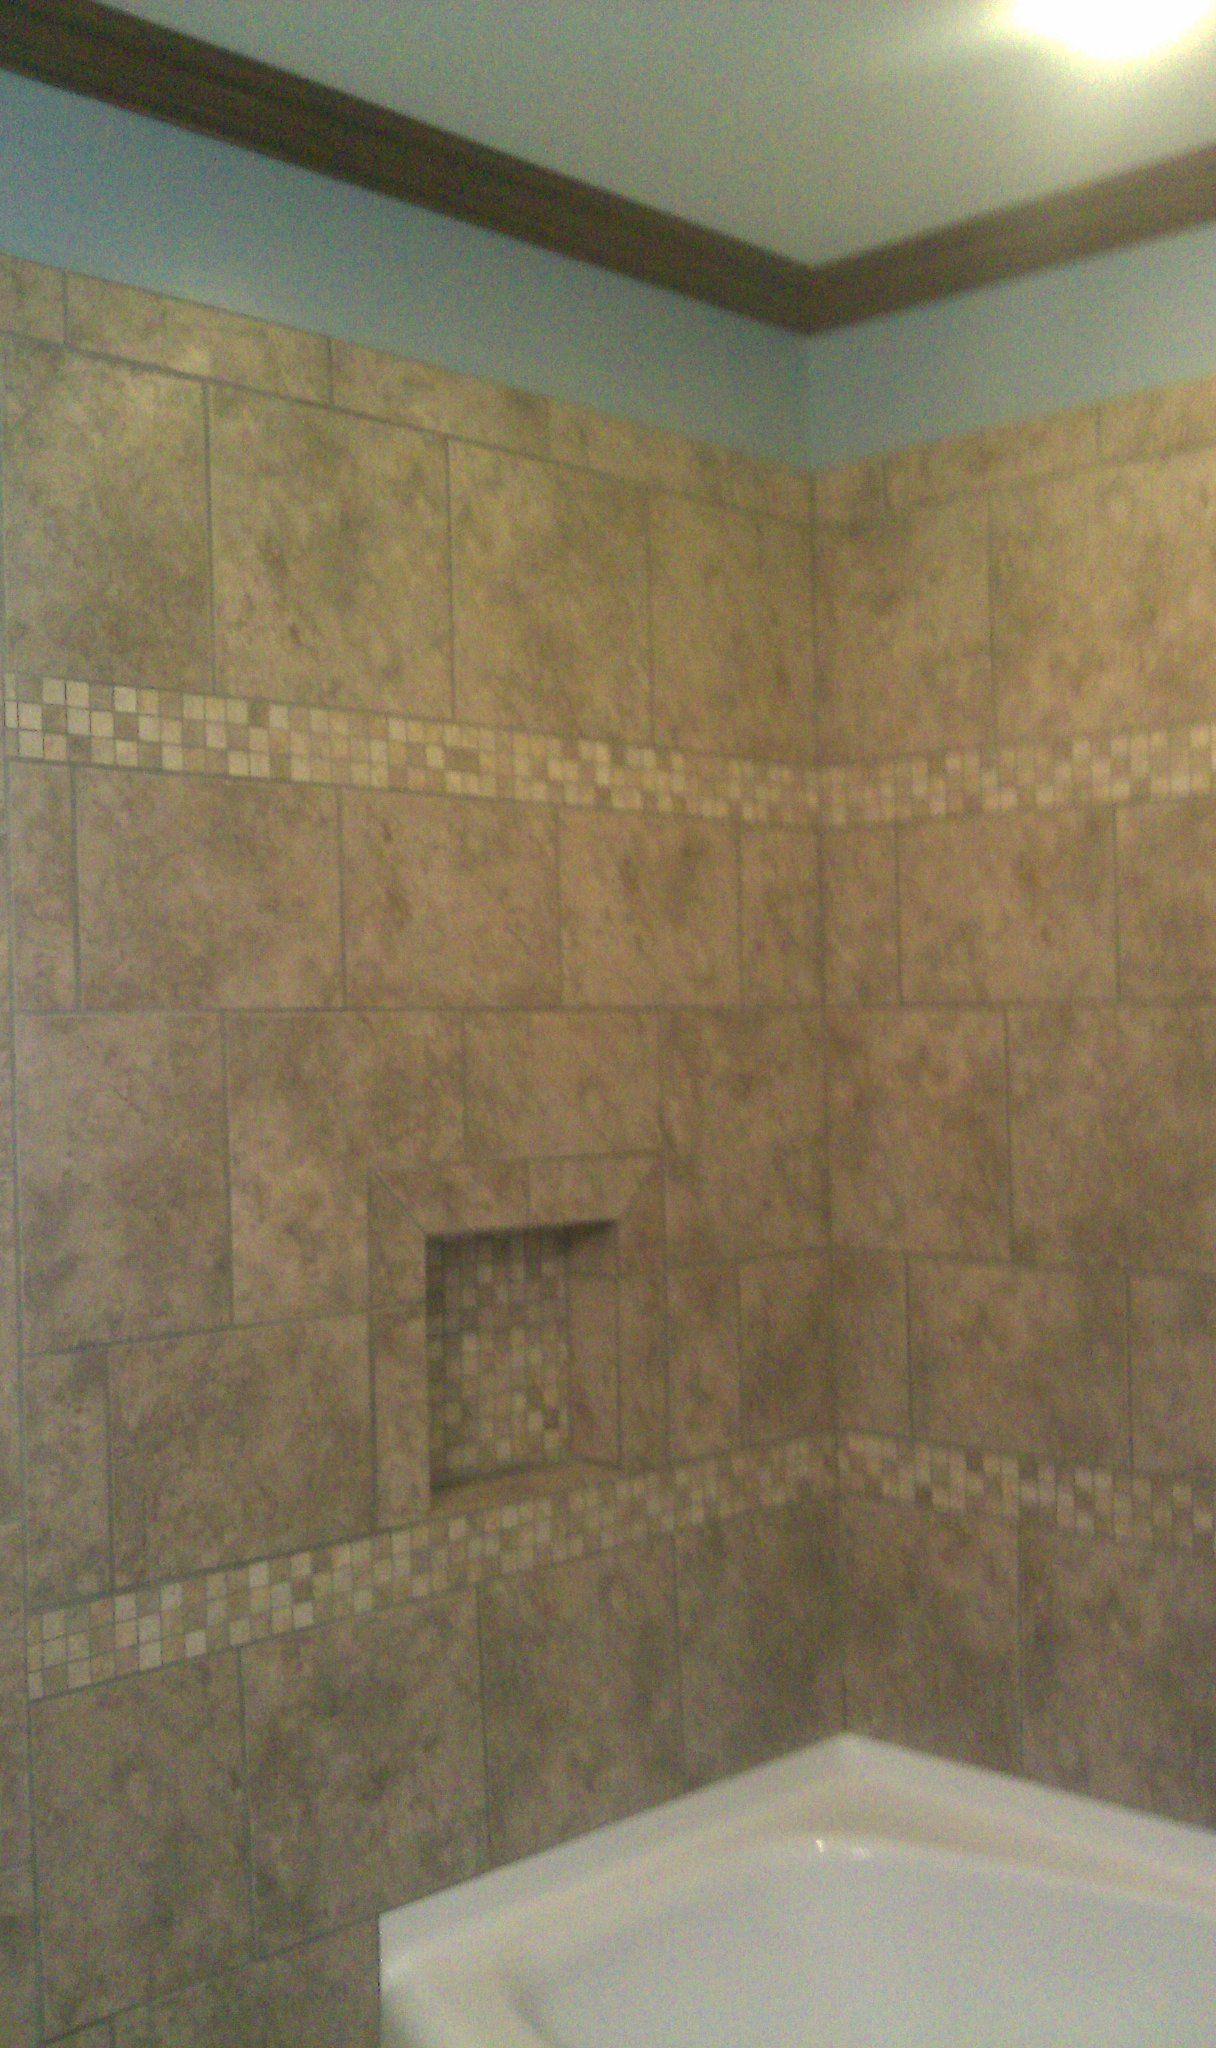 Fiberglass bathtub tile surround, stained crown molding | Tile ...